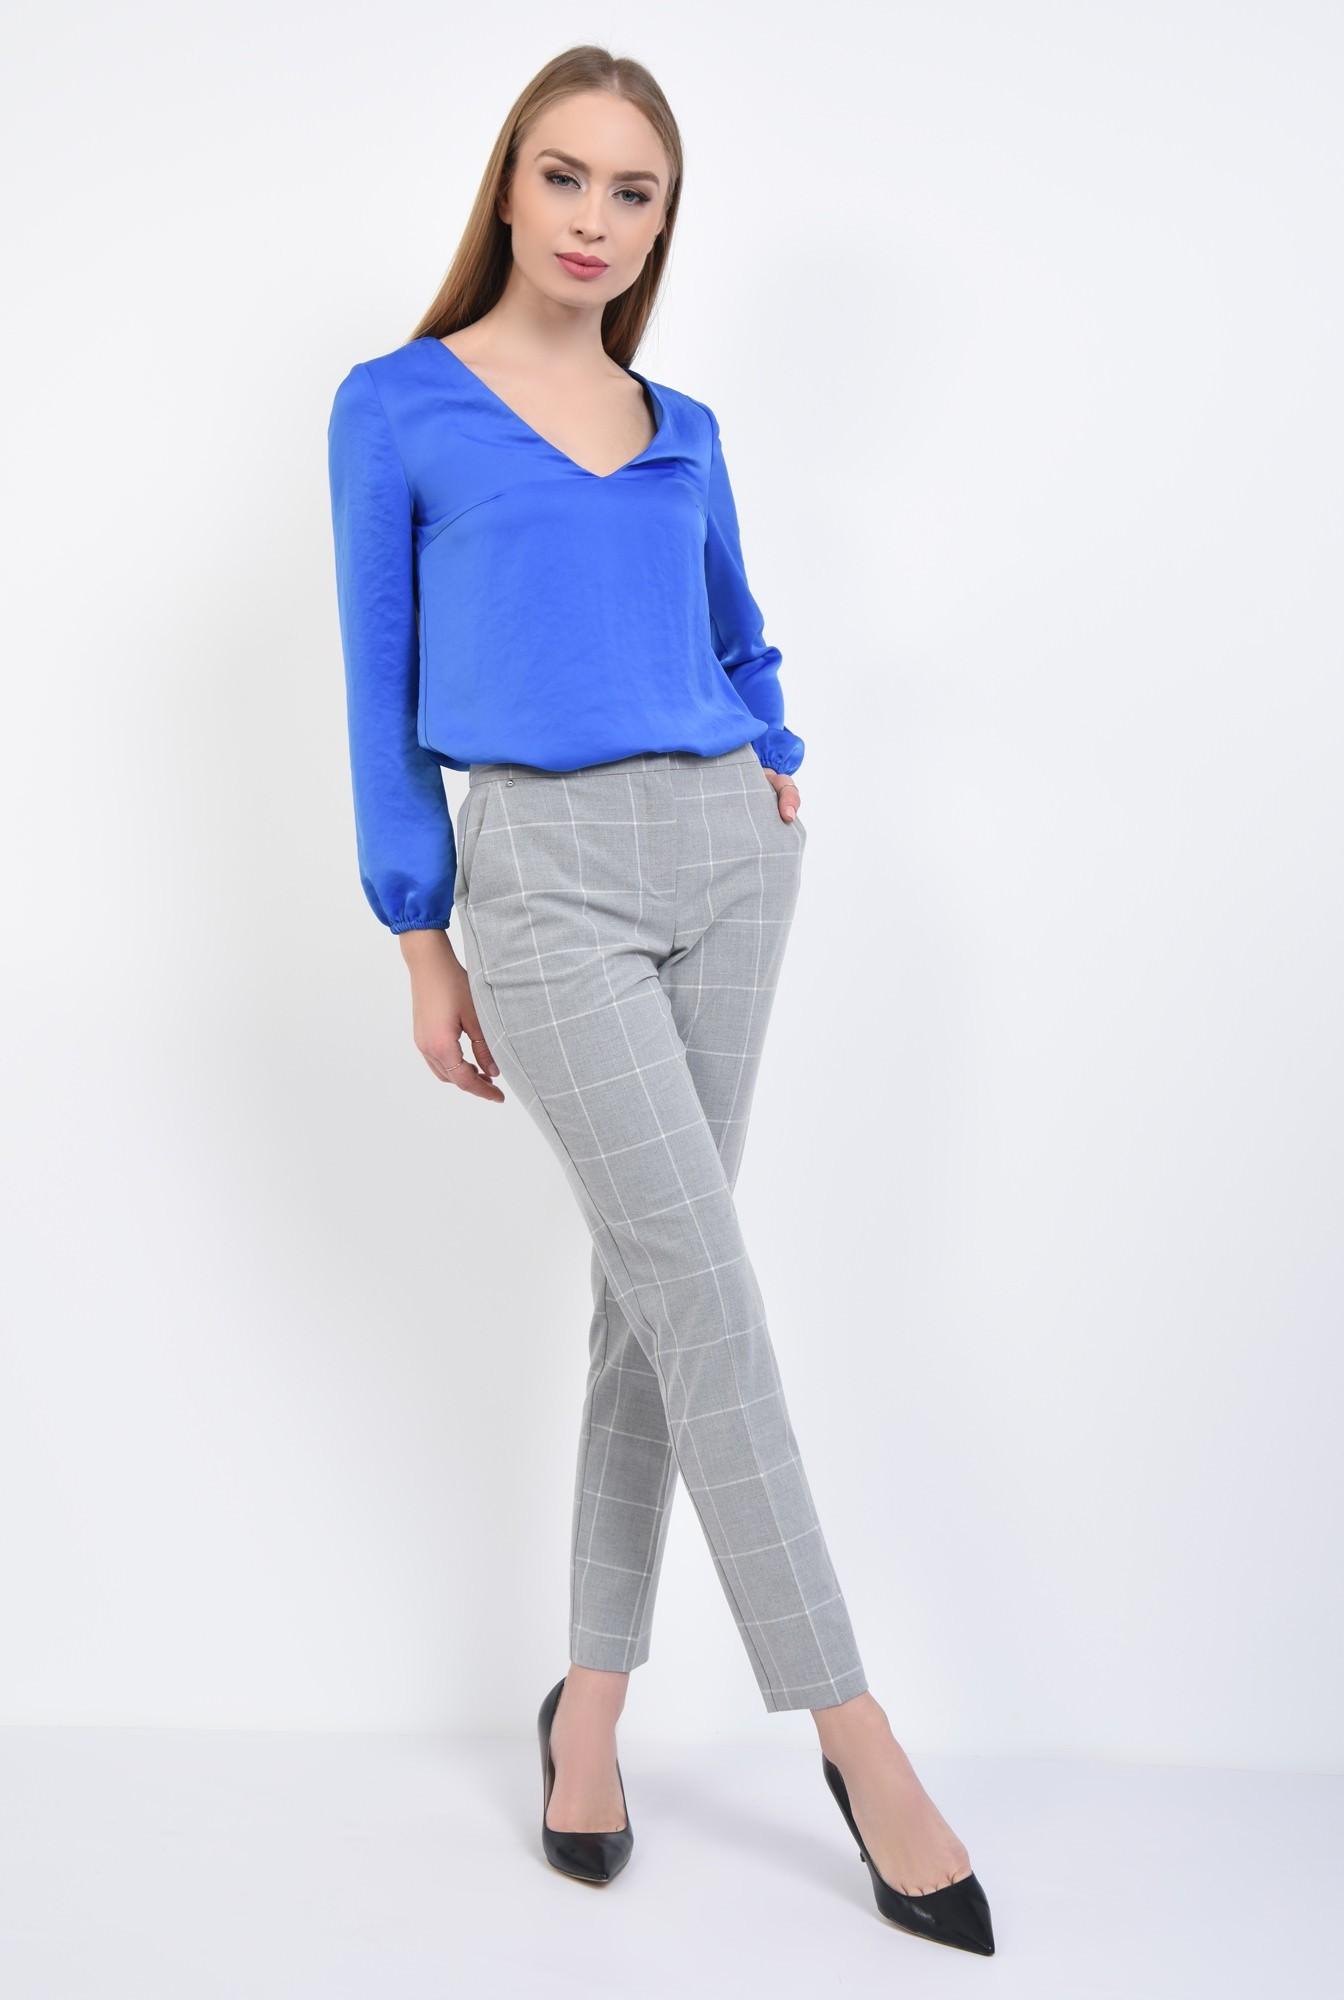 3 - Pantaloni casual, imprimeu